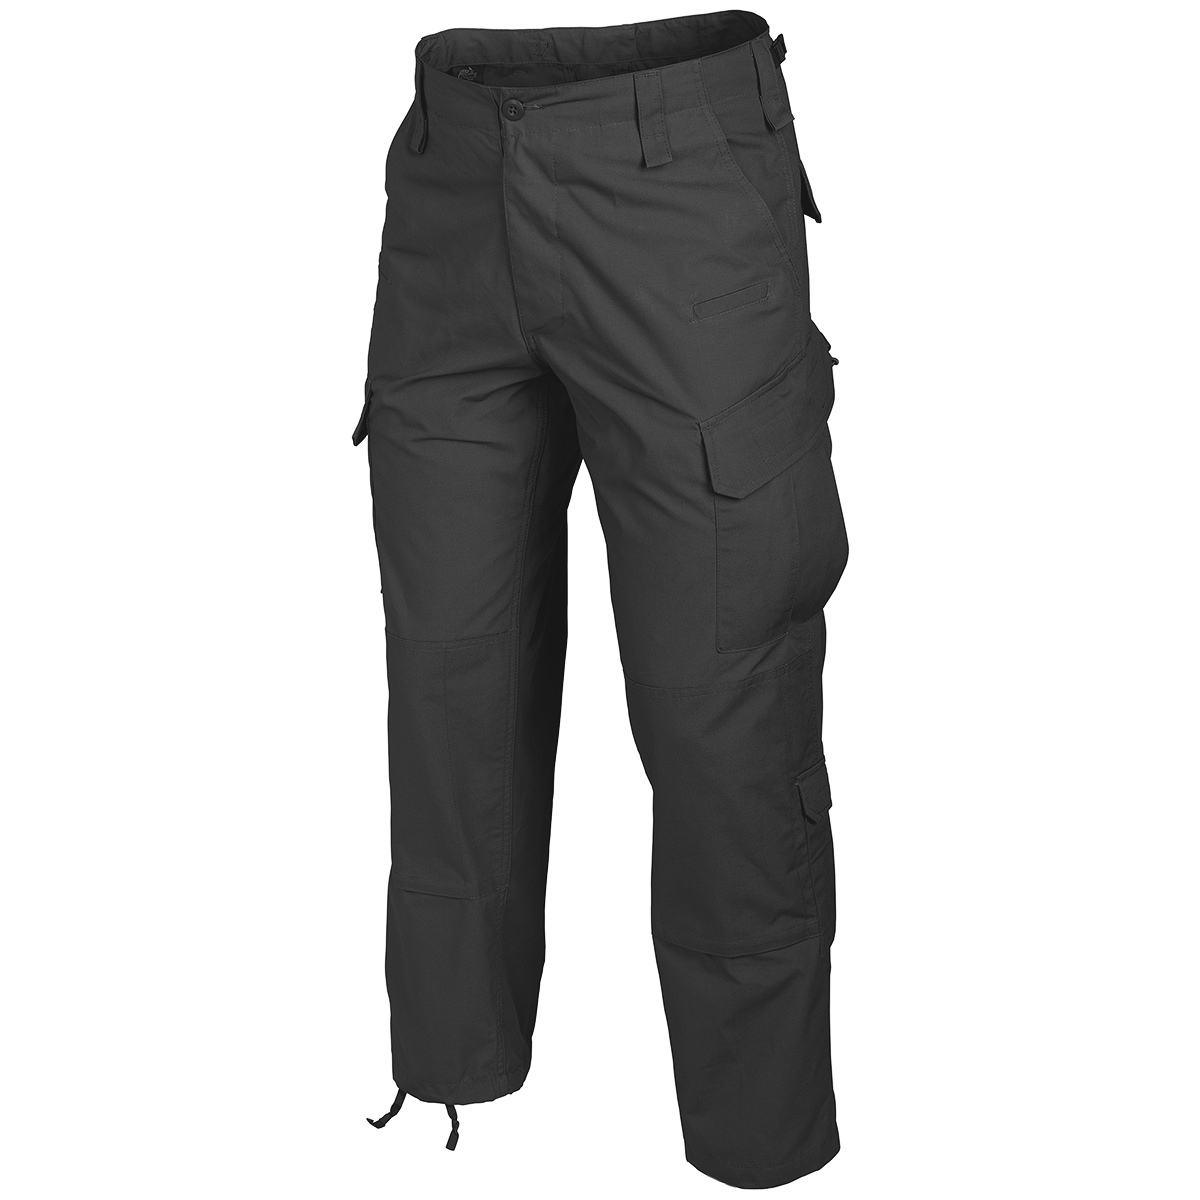 black tactical cargo pants - photo #8